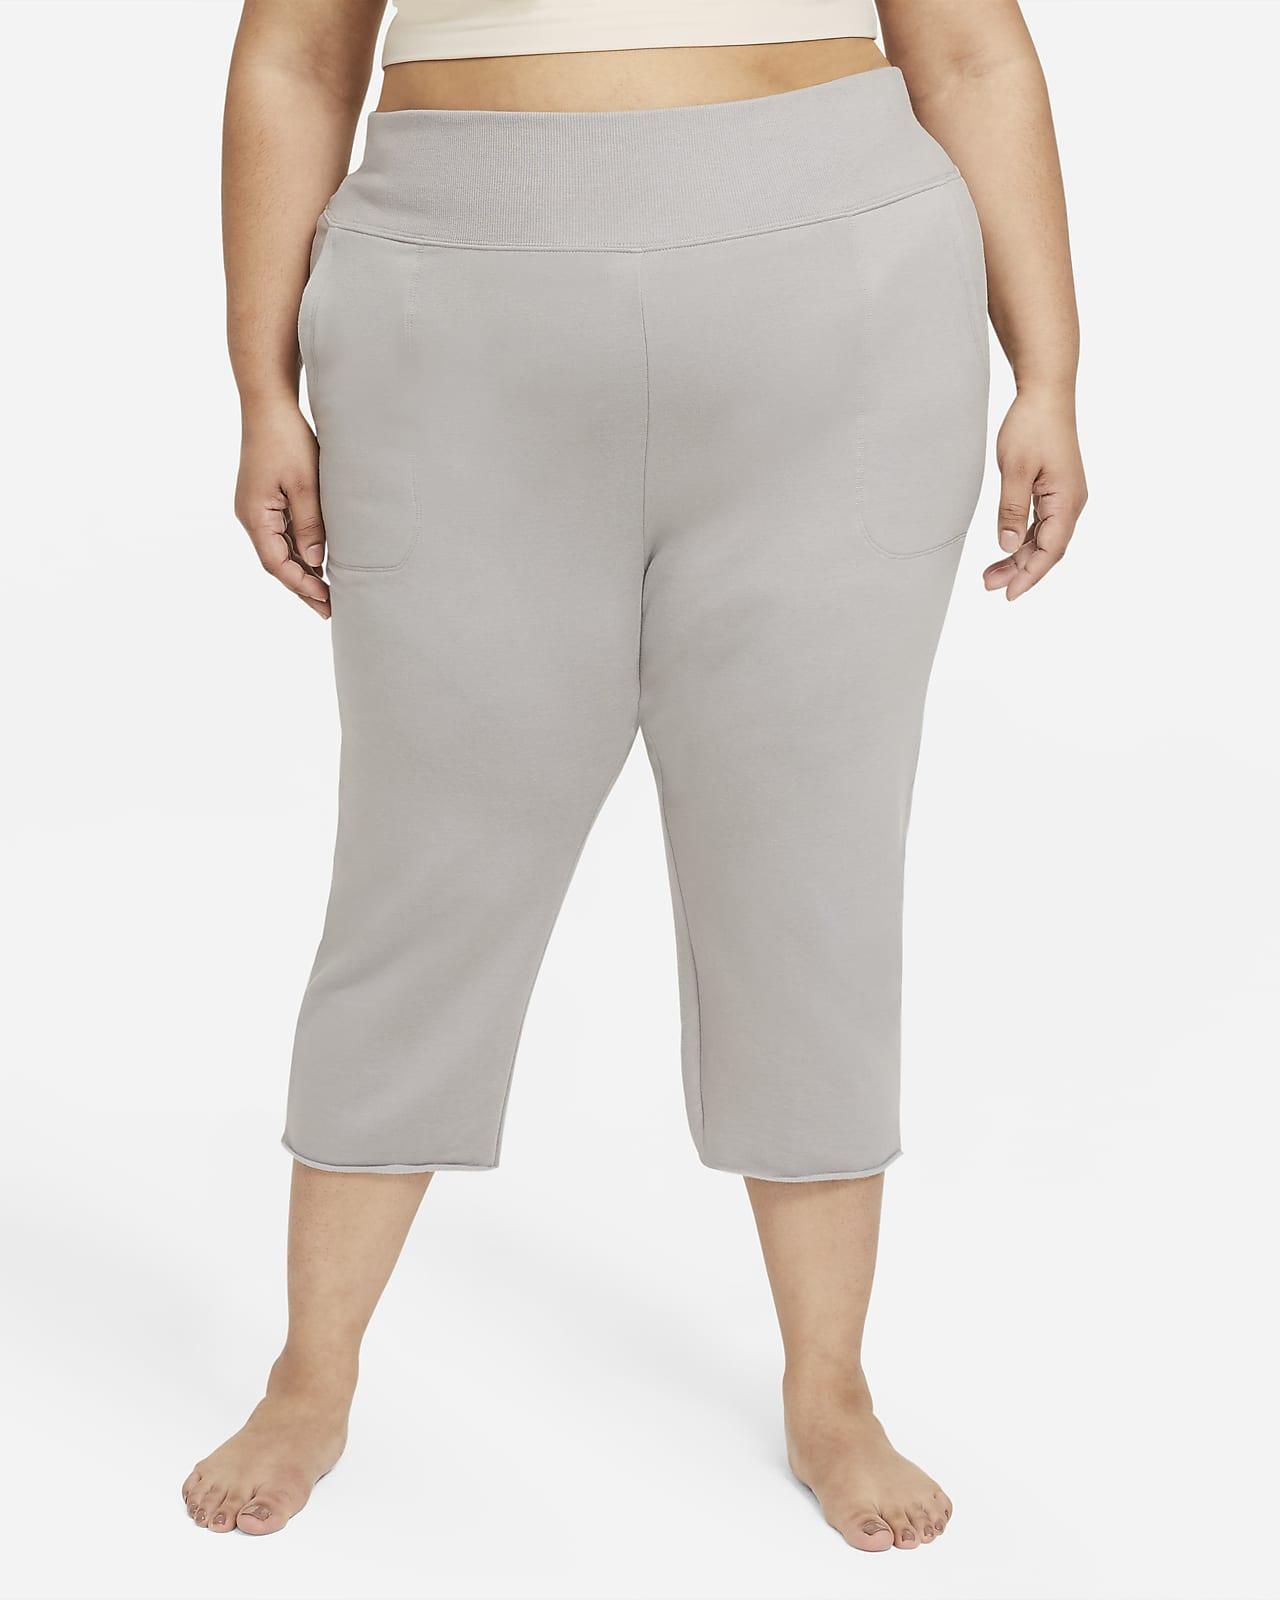 Pantalones de pescador de tejido Fleece para mujer Nike Yoga Luxe (talla grande)